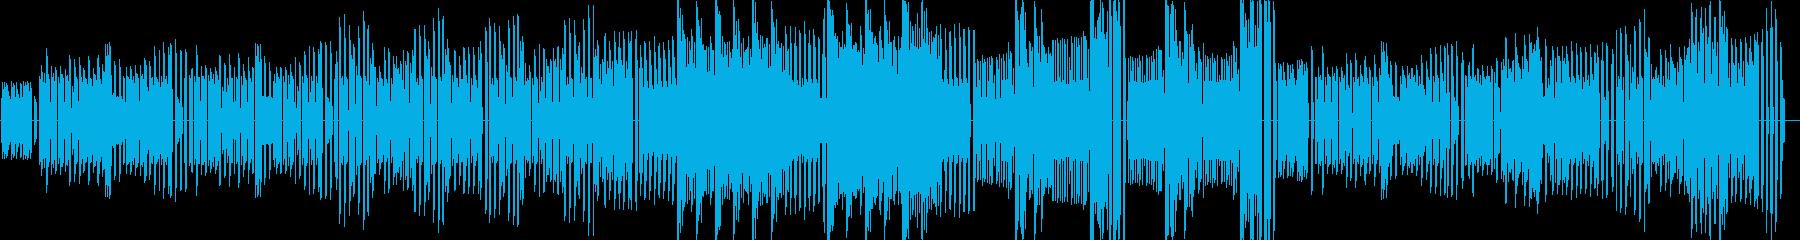 KANT運動会曲クシコスポスト8bitの再生済みの波形